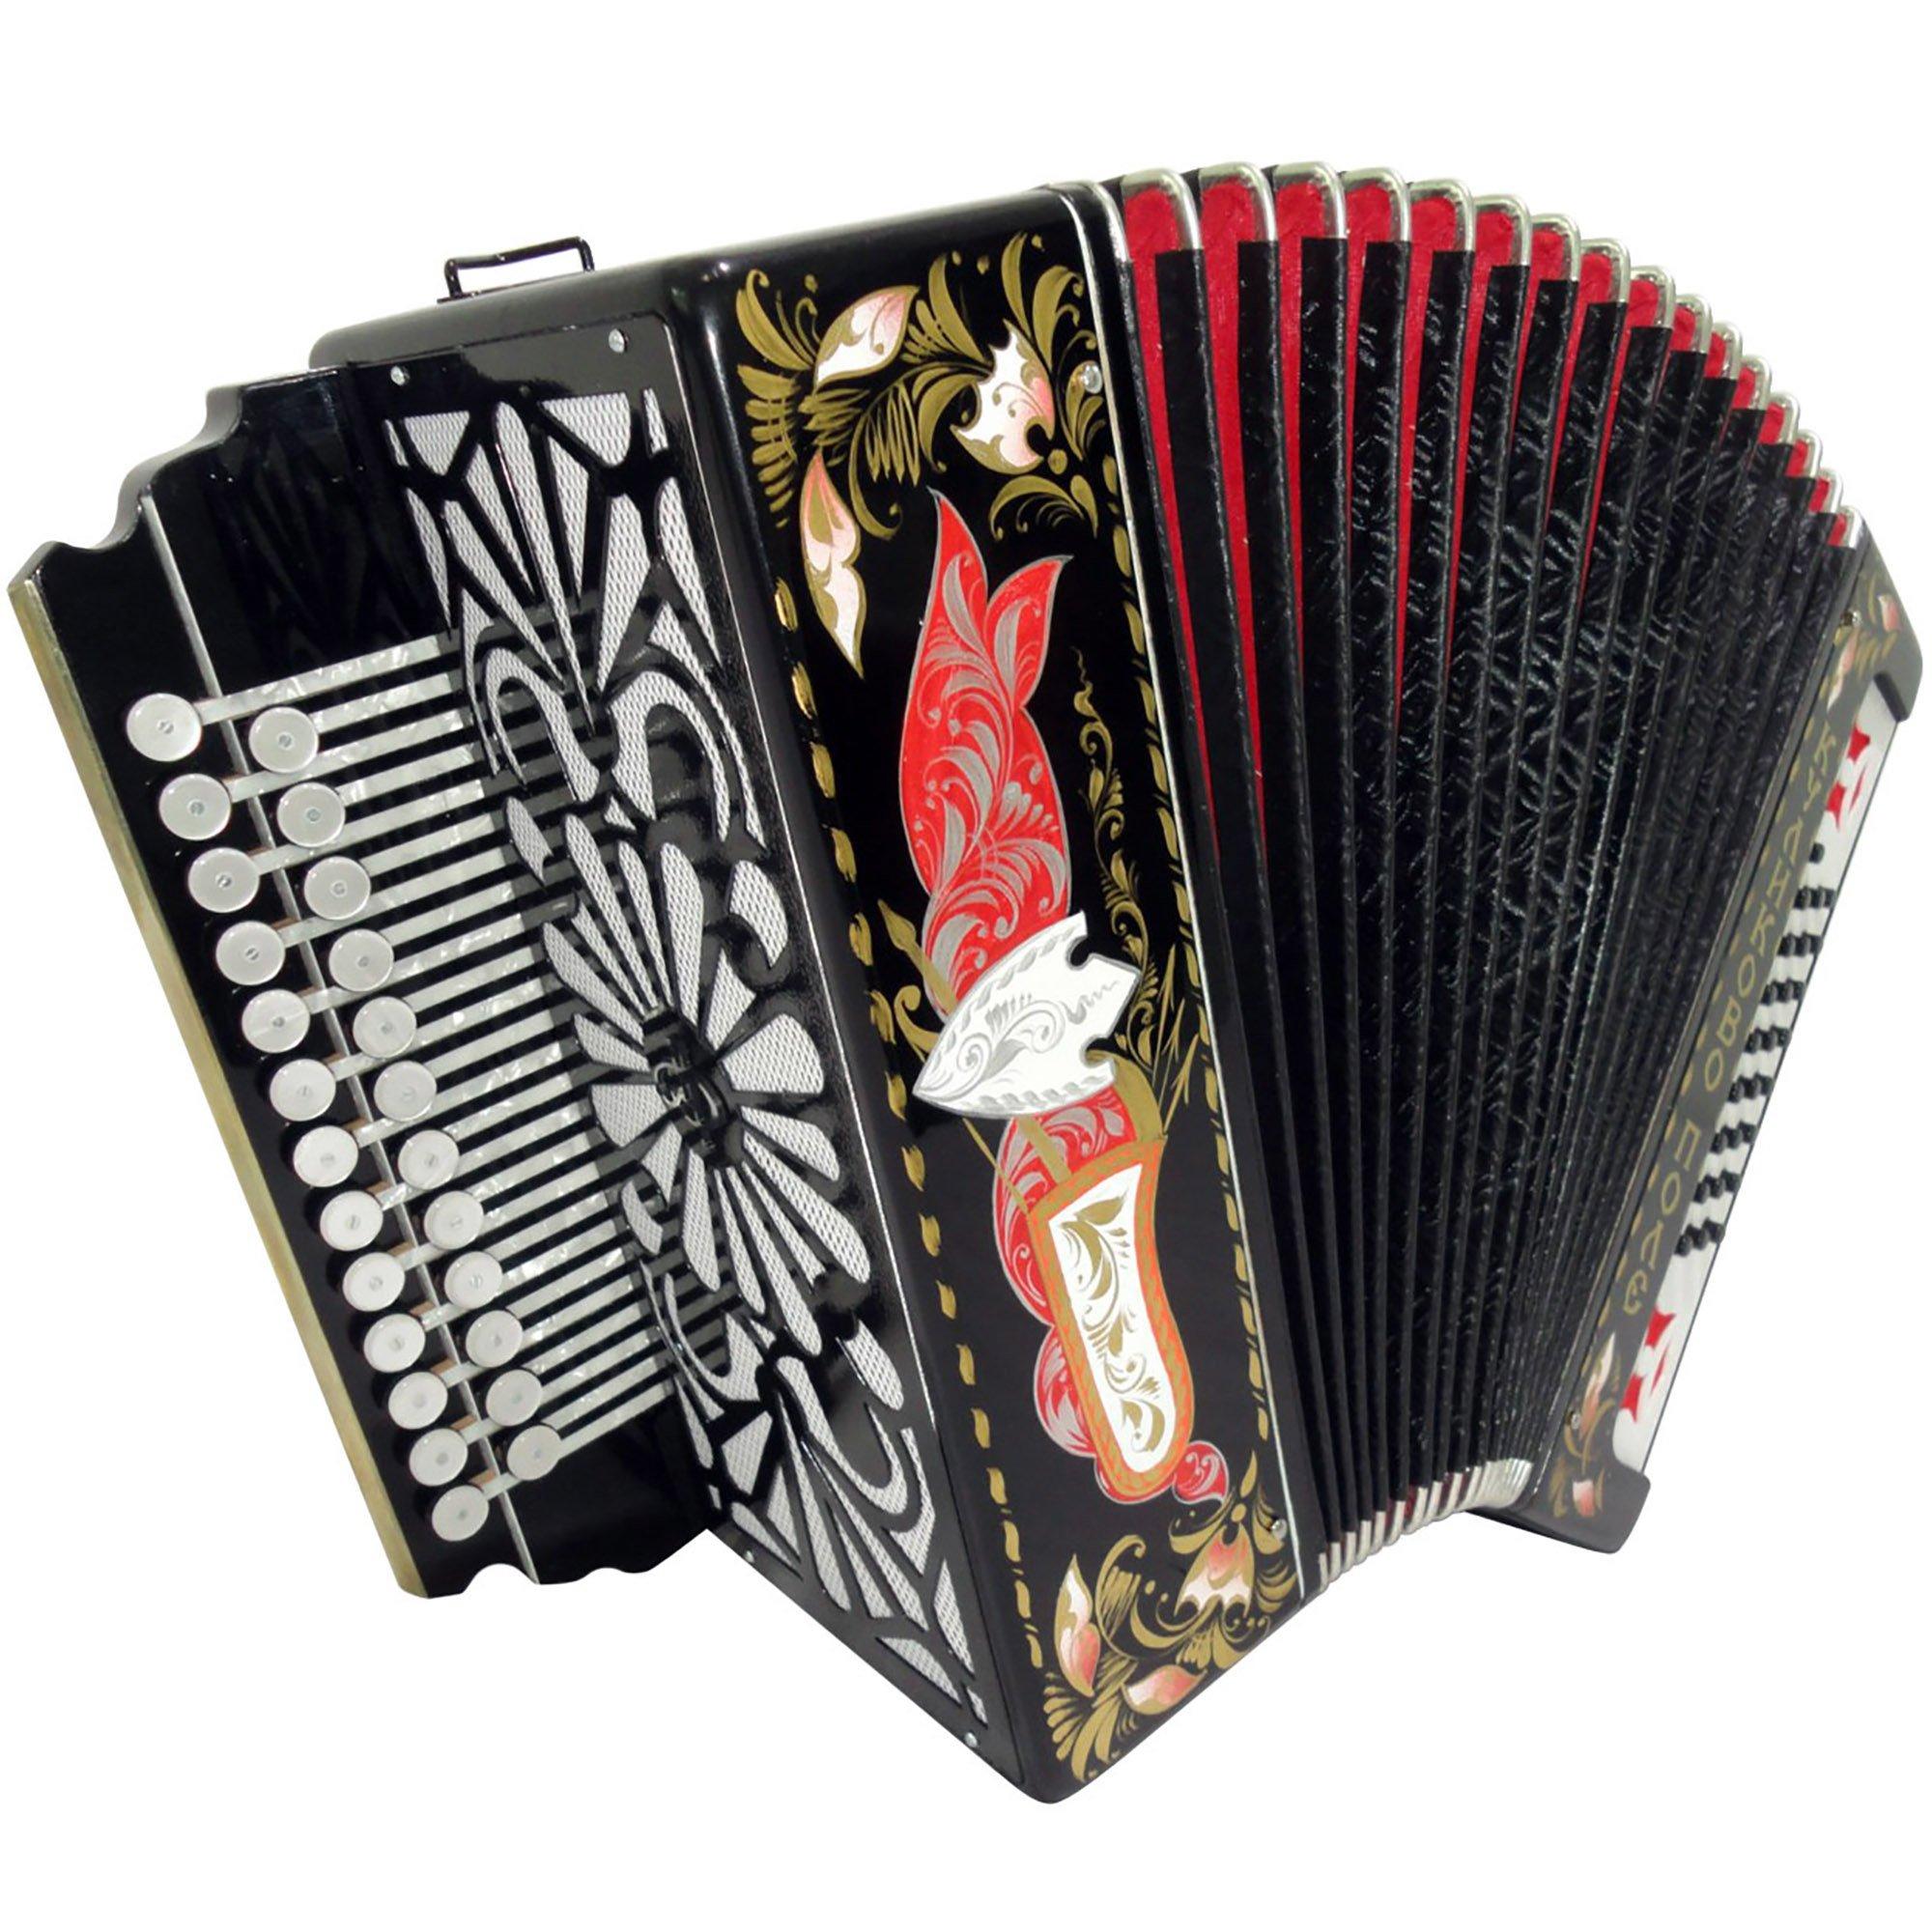 Brand New Russian Tulskaya Garmon Kulikov Field, Kulikovo Pole, Tula Harmonika, Button Accordion, High-class Musical Instrument, 3-tonal, 2 Rows 25x25 G 3 by Tulskaya Garmon